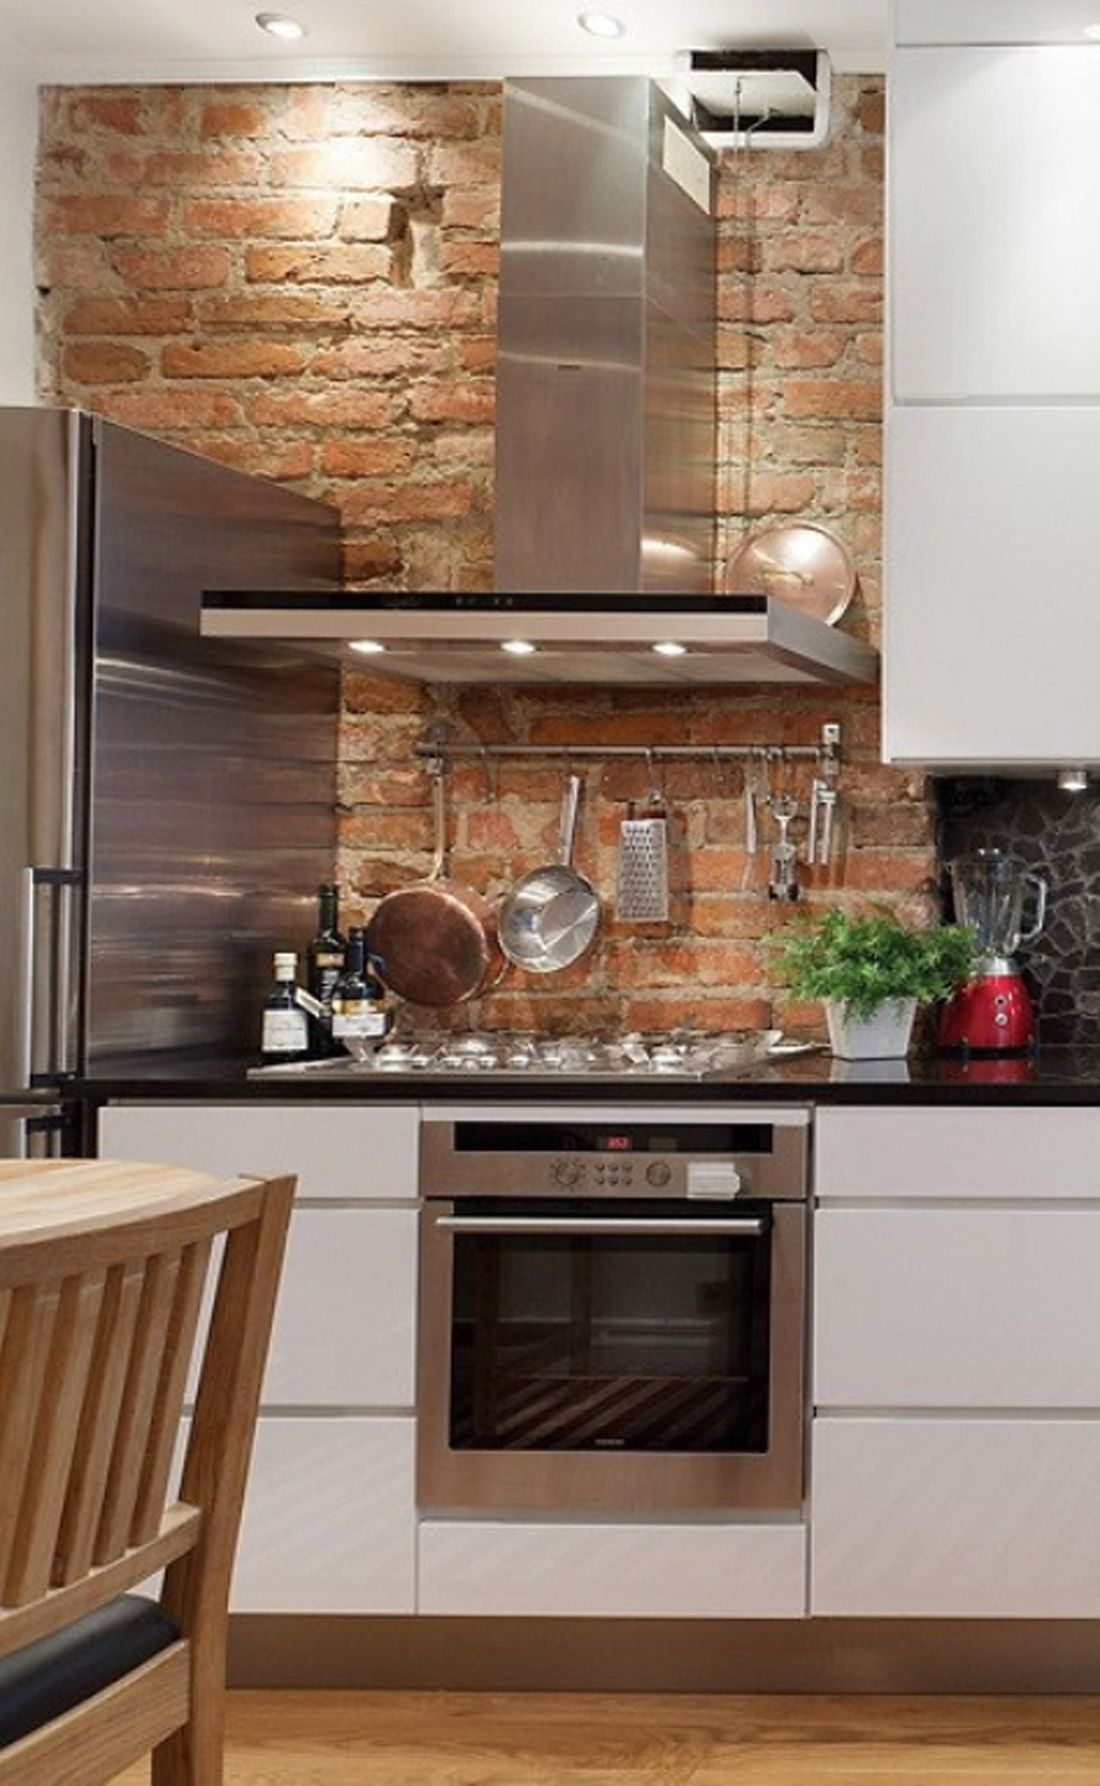 backsplash for kitchens brick backsplash for kitchens Interior Brick Wall Design Fabulous Brick Wall Kitchen Backsplash